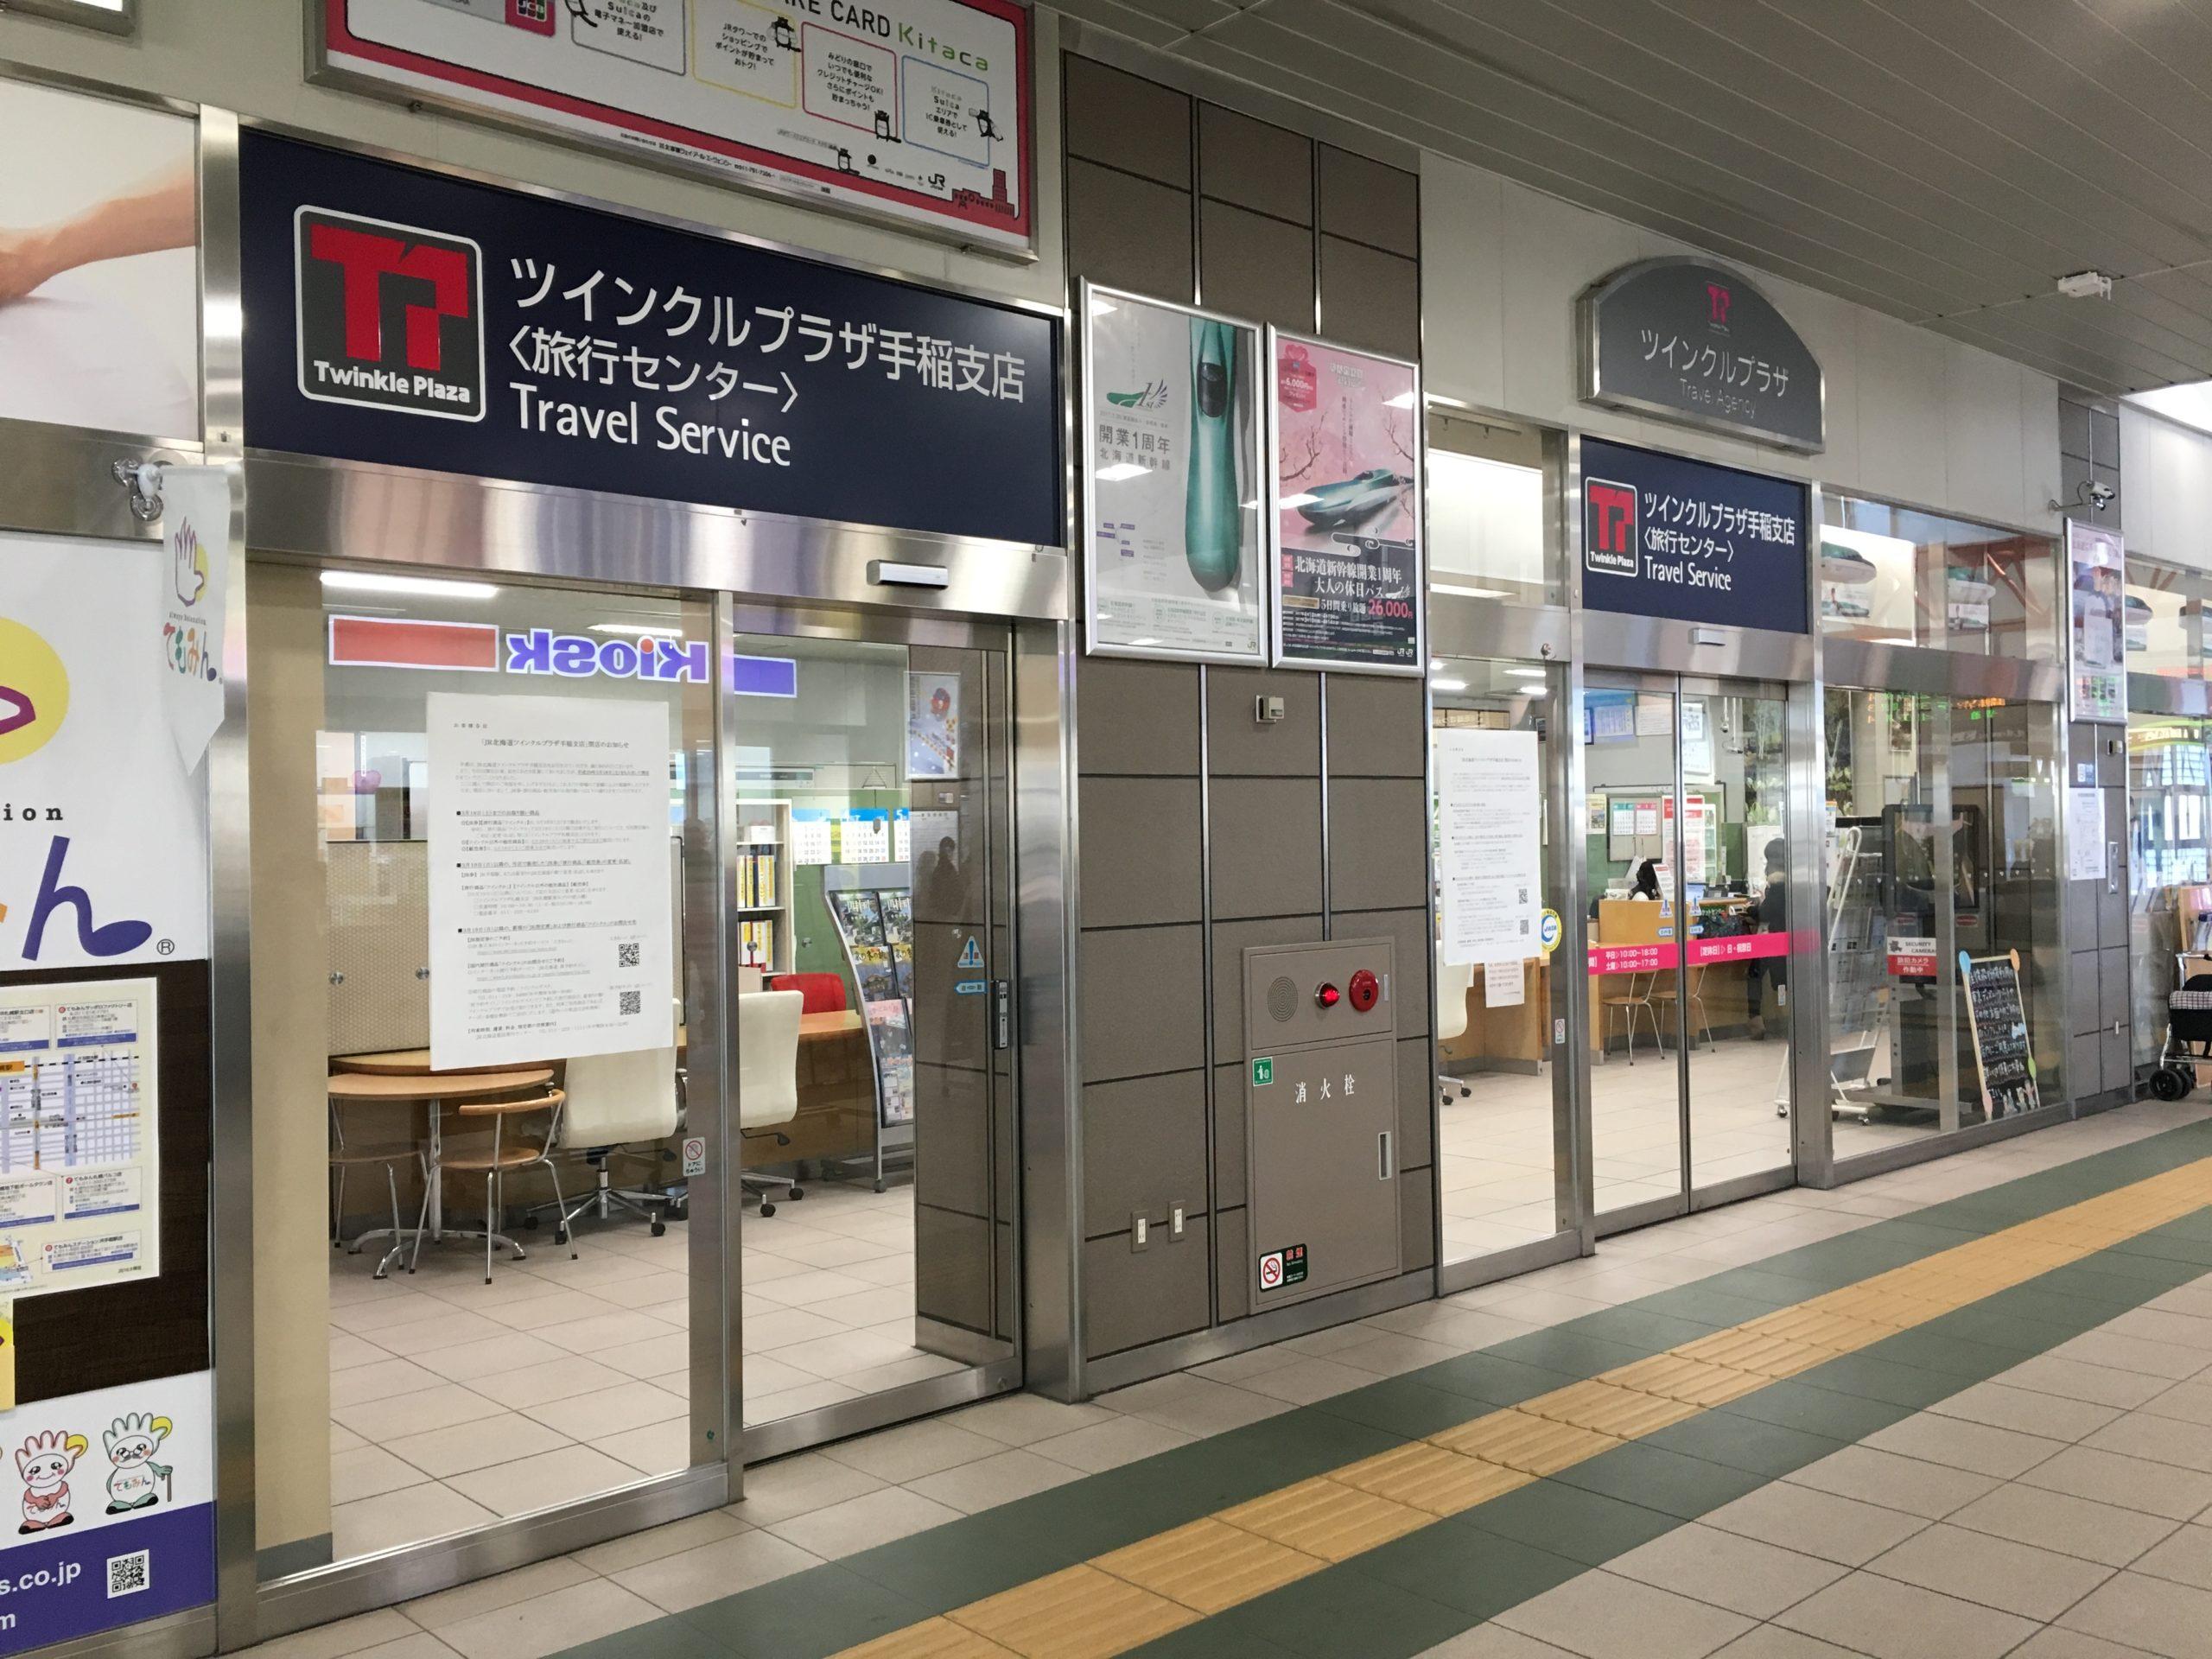 JR北海道「ツインクルプラザ」全店閉店 新型コロナで1年前倒し